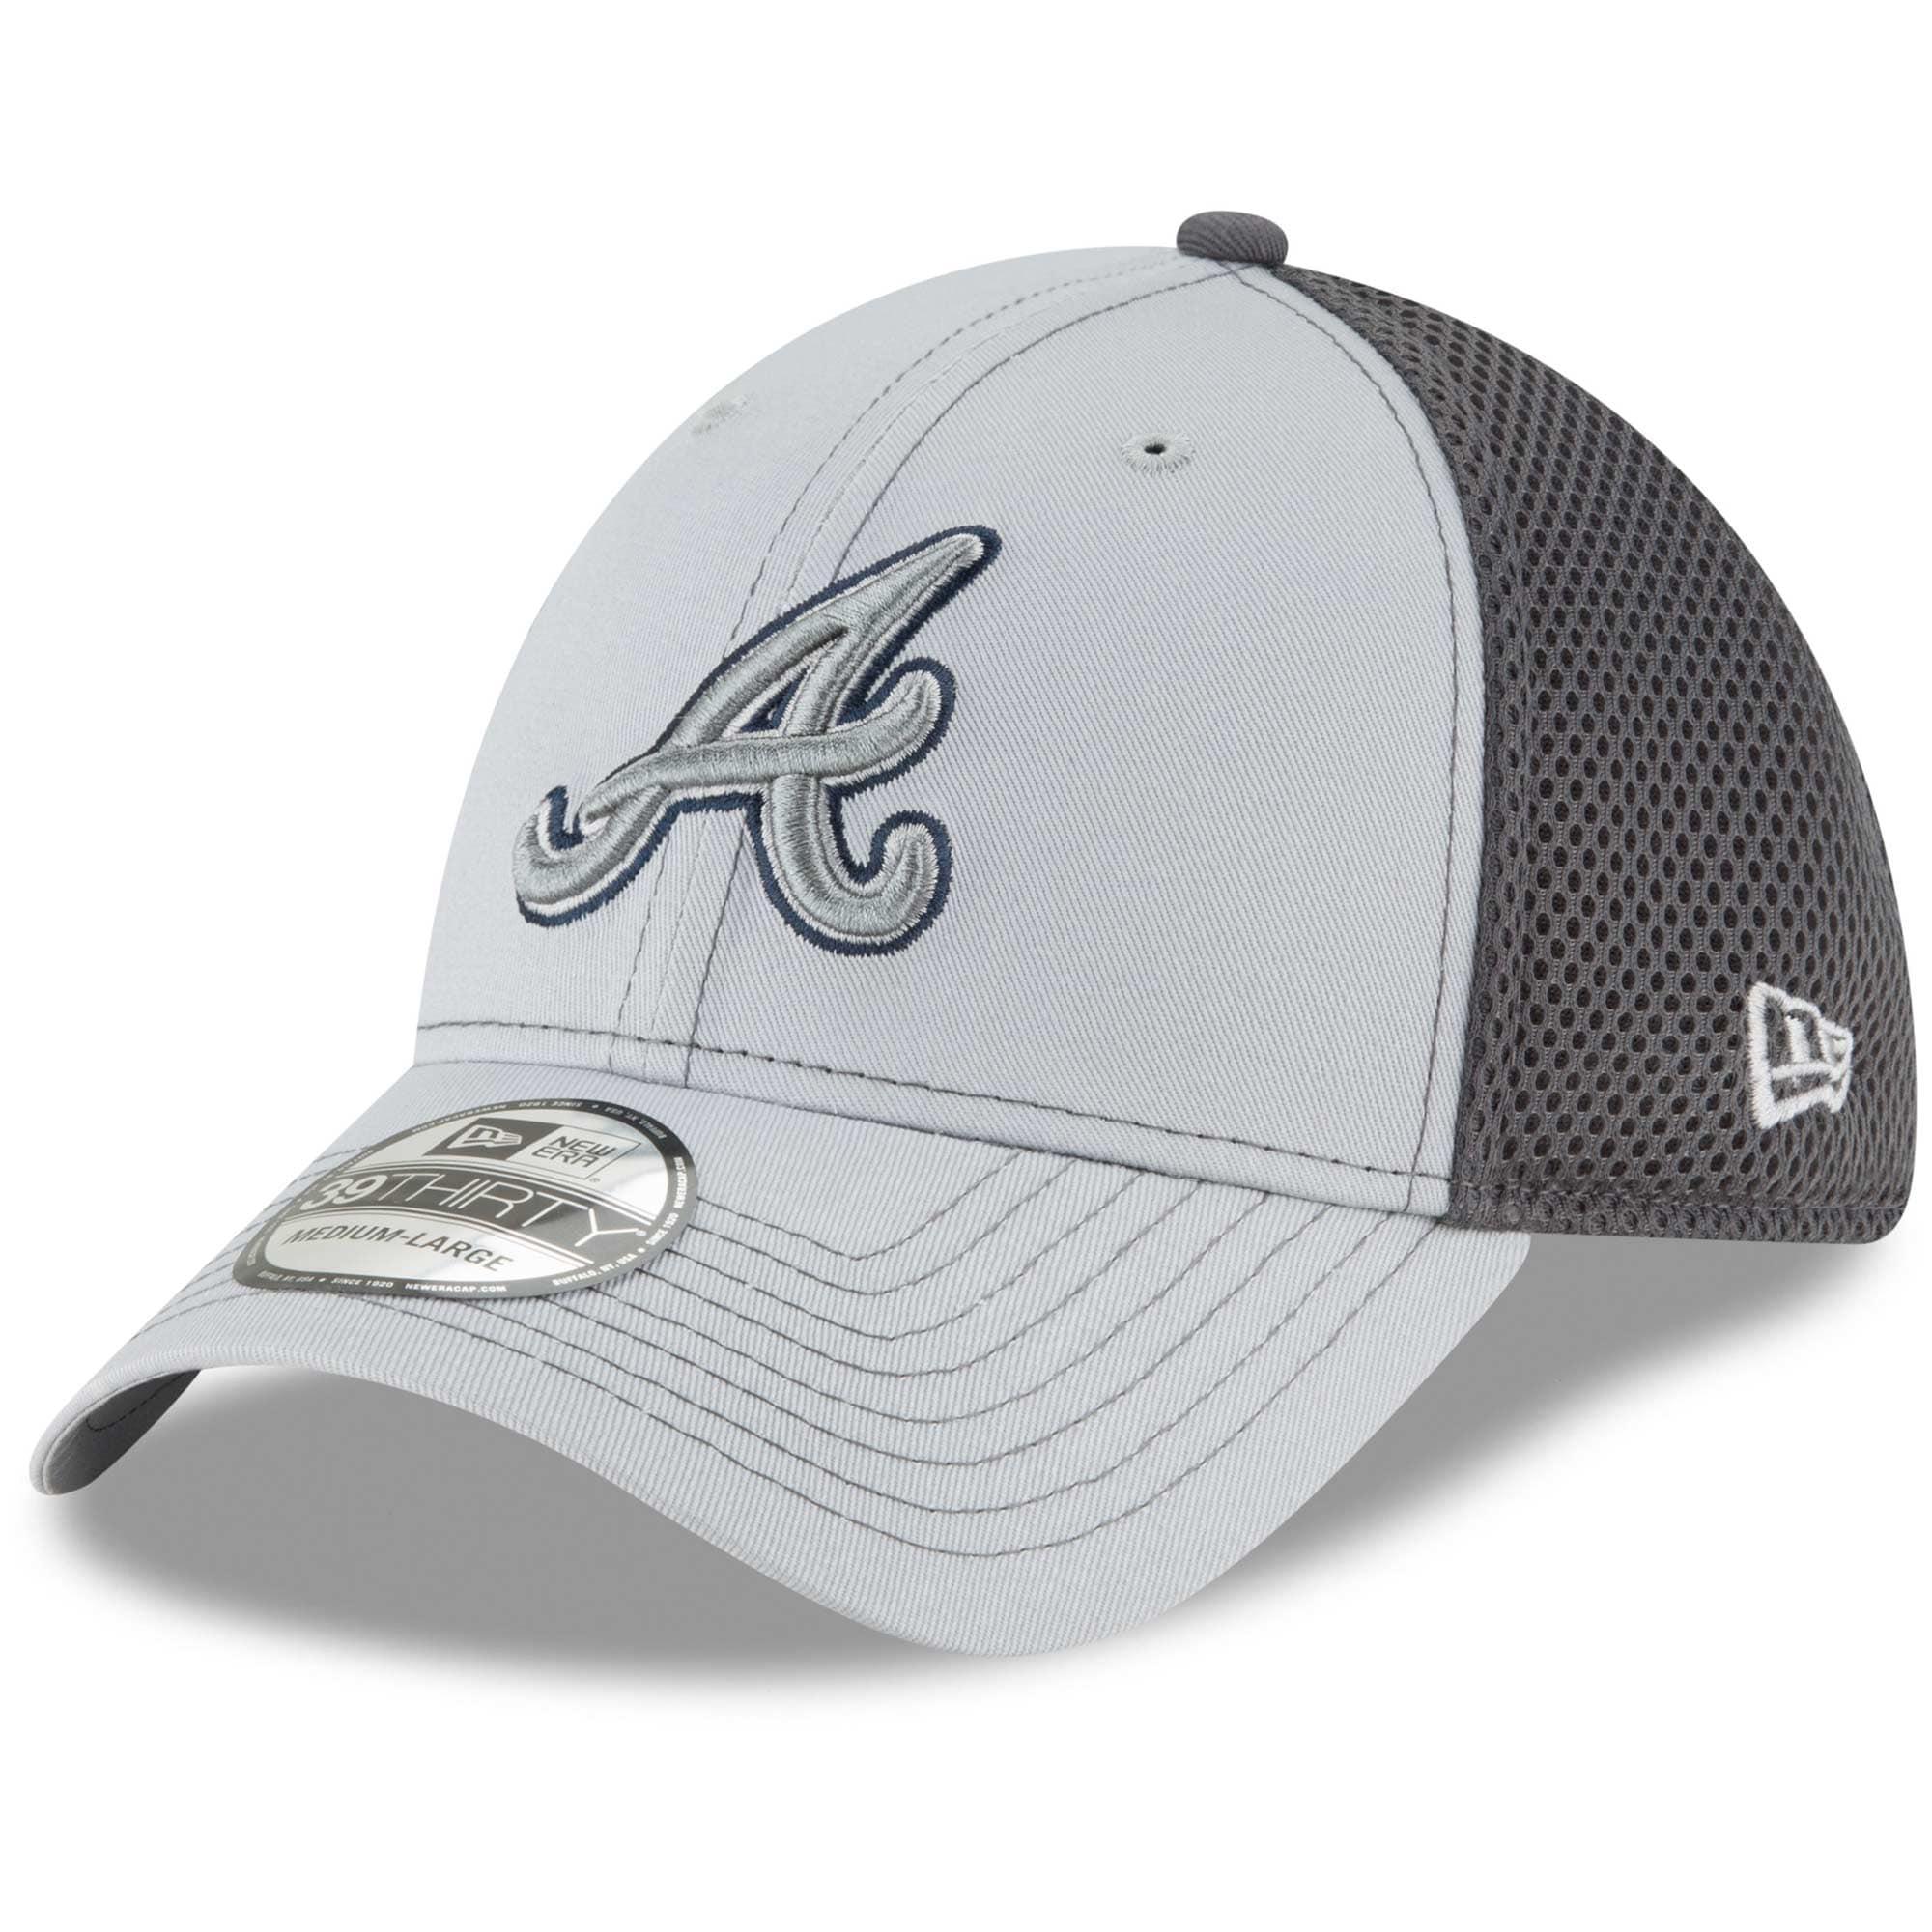 Atlanta Braves New Era Grayed Out Neo 39THIRTY Flex Hat - Gray